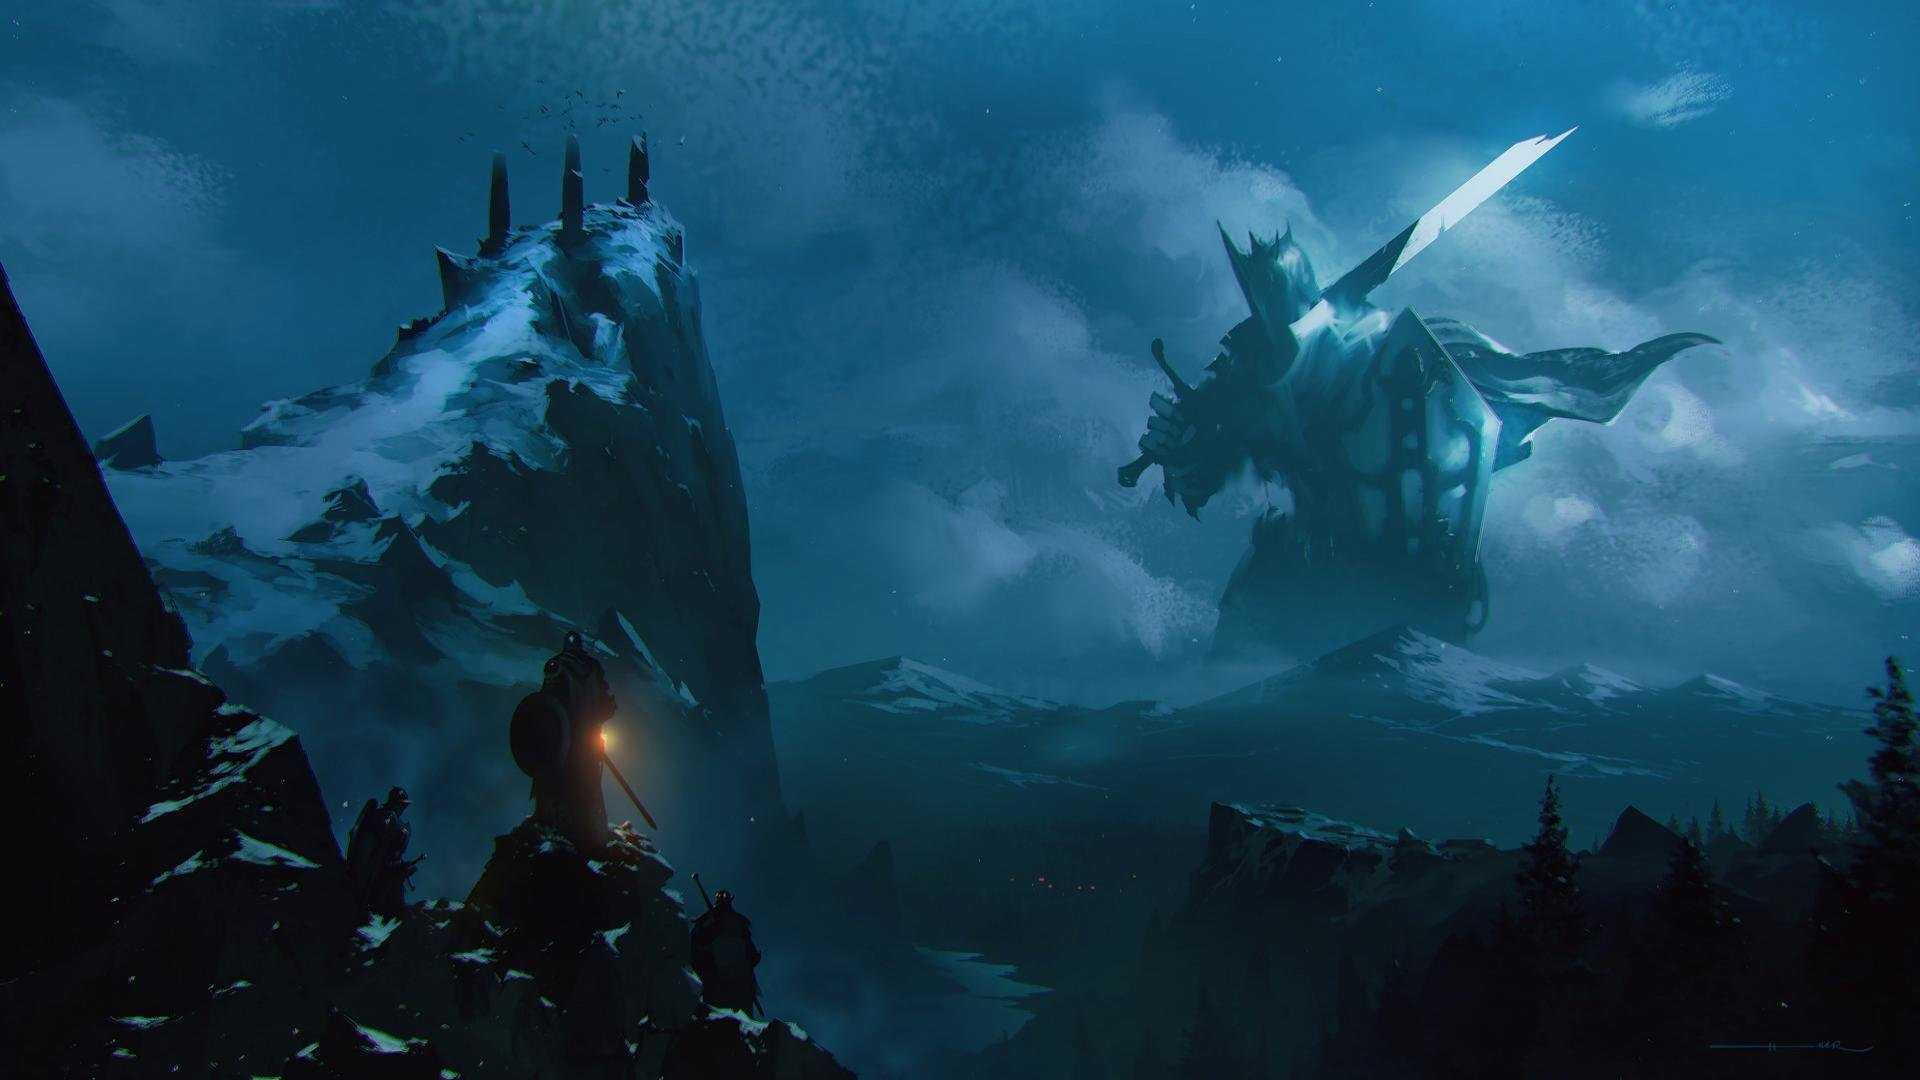 Giant Art best background